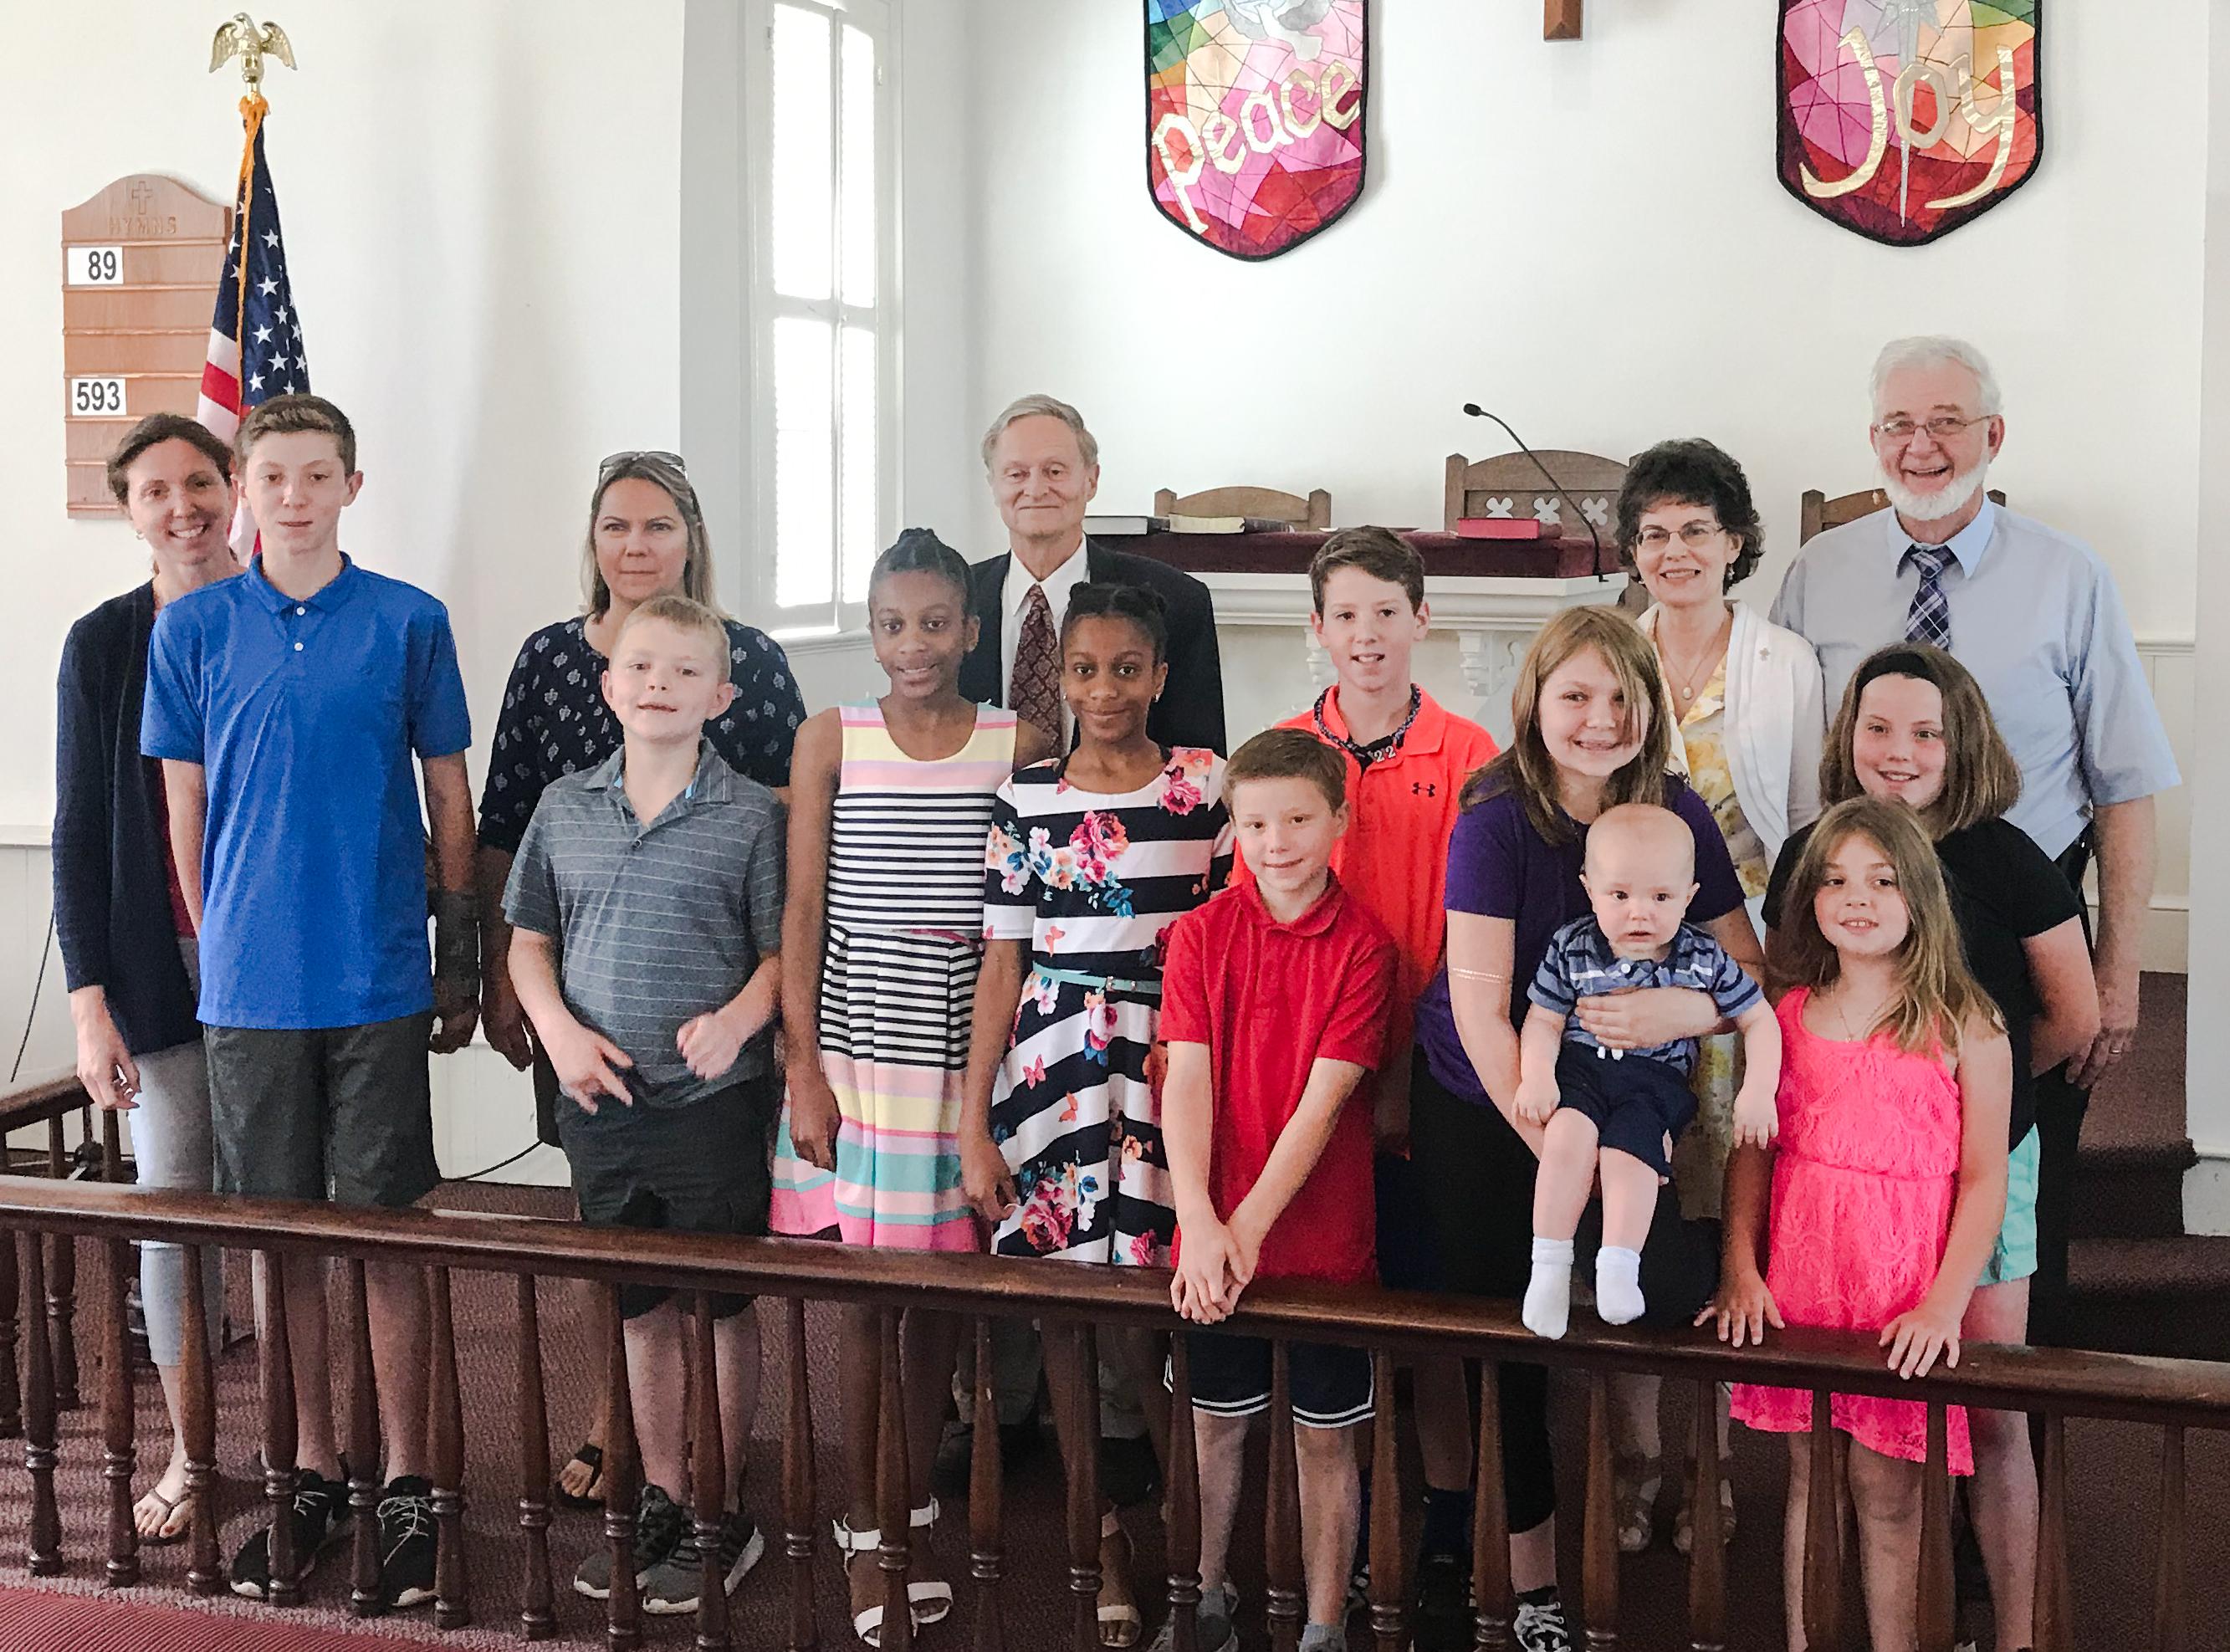 Children and teachers on Children's Sunday